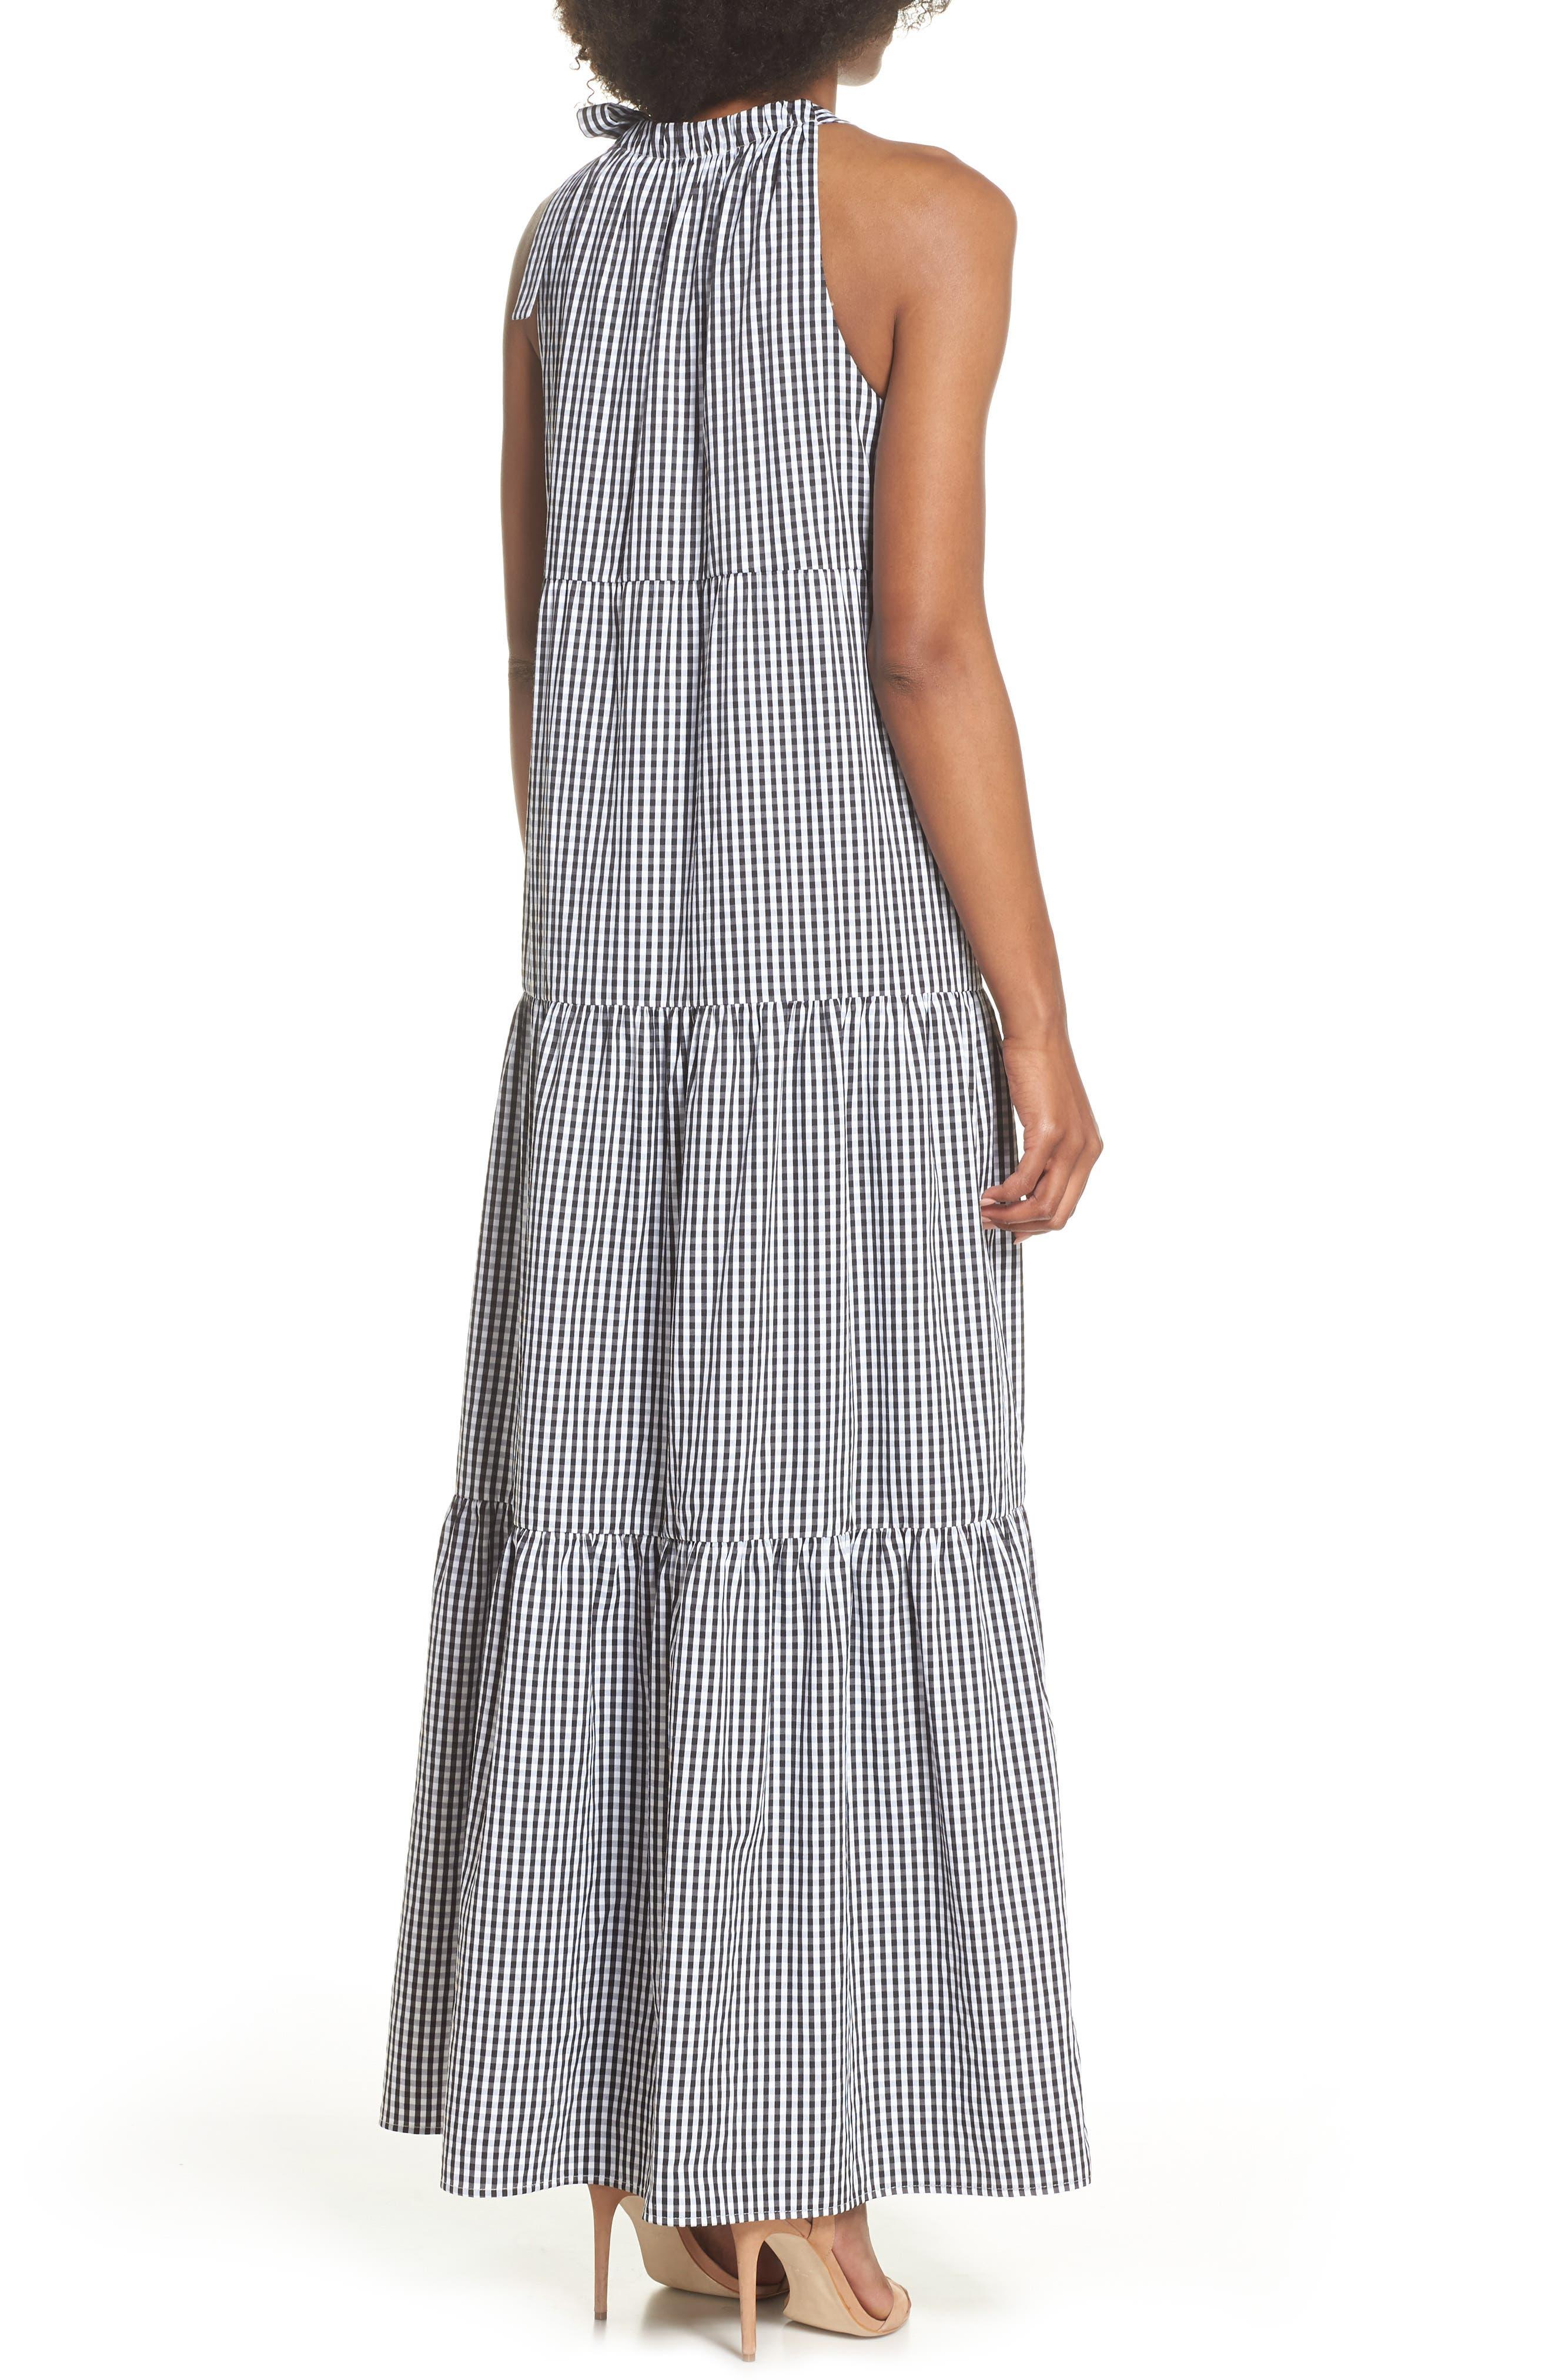 Gingham Check Maxi Dress,                             Alternate thumbnail 2, color,                             100